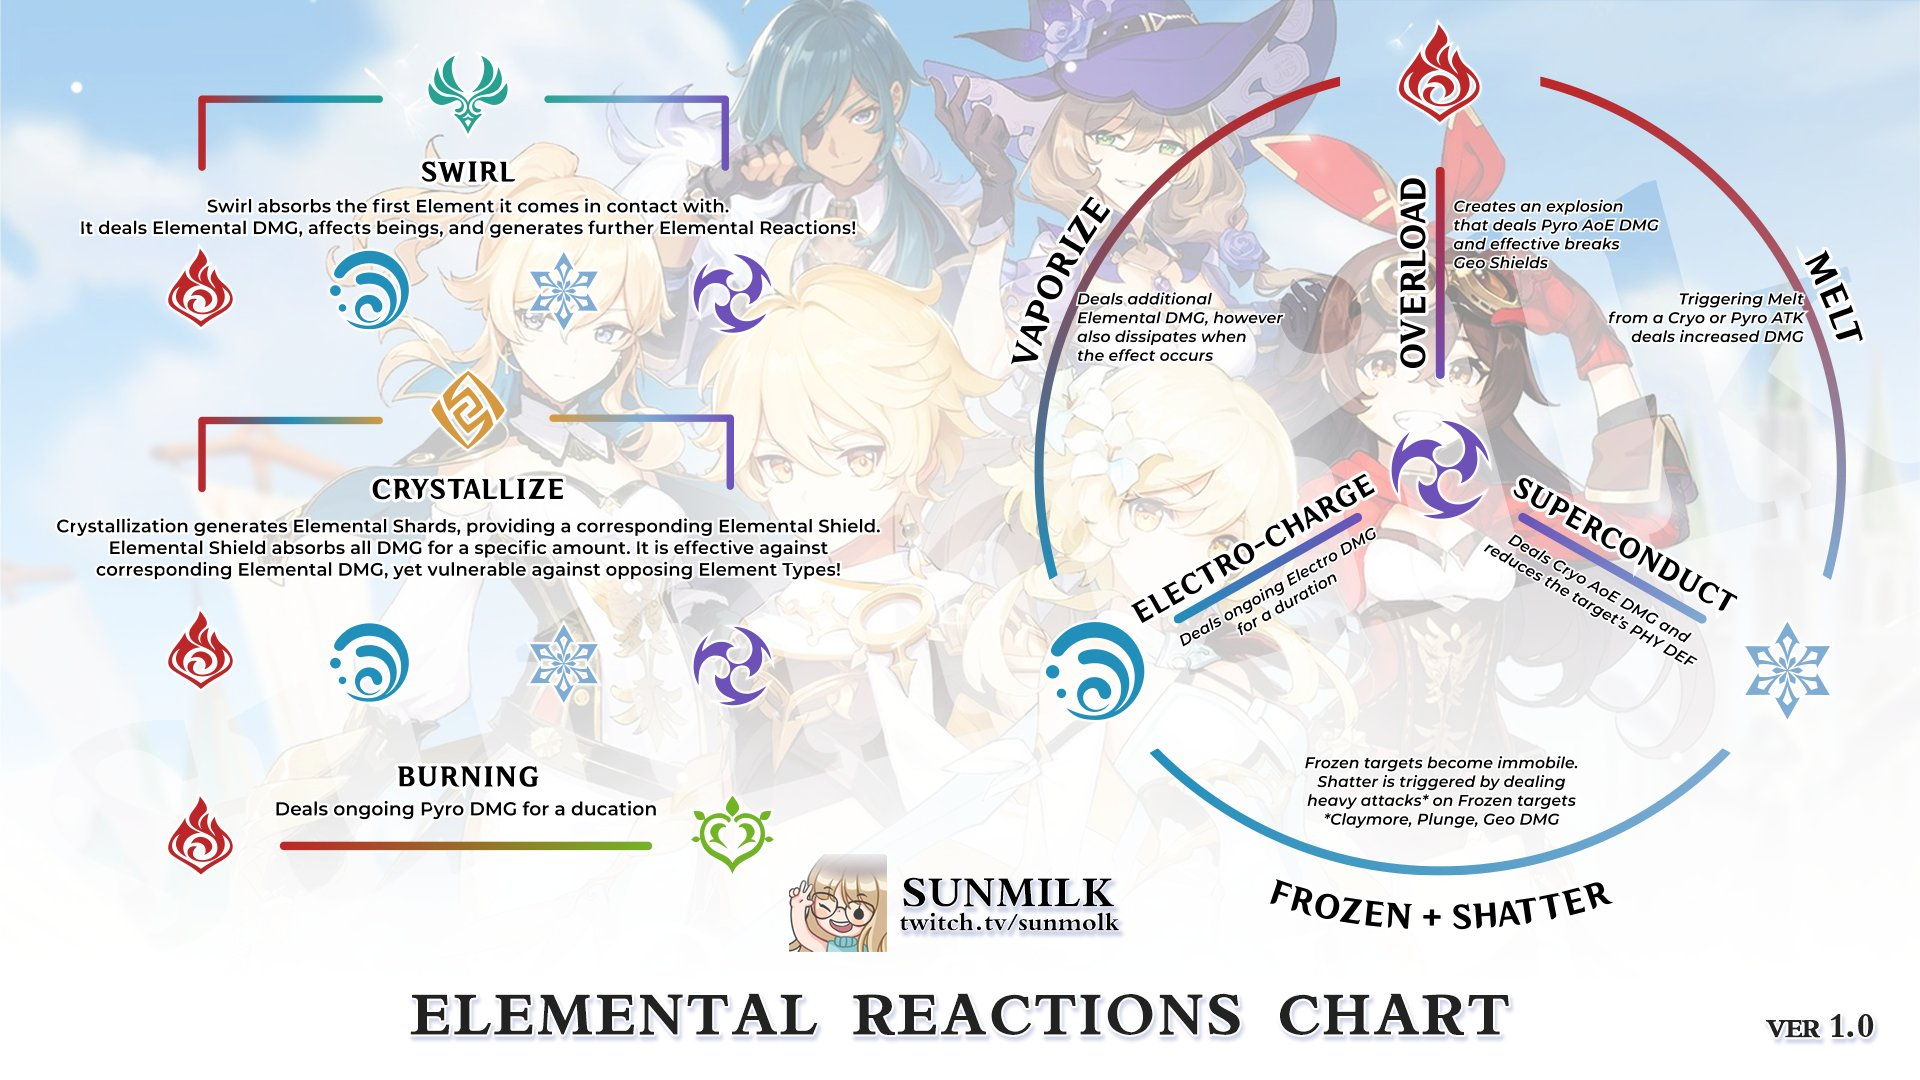 Genshin Impact Elemental Reactions All